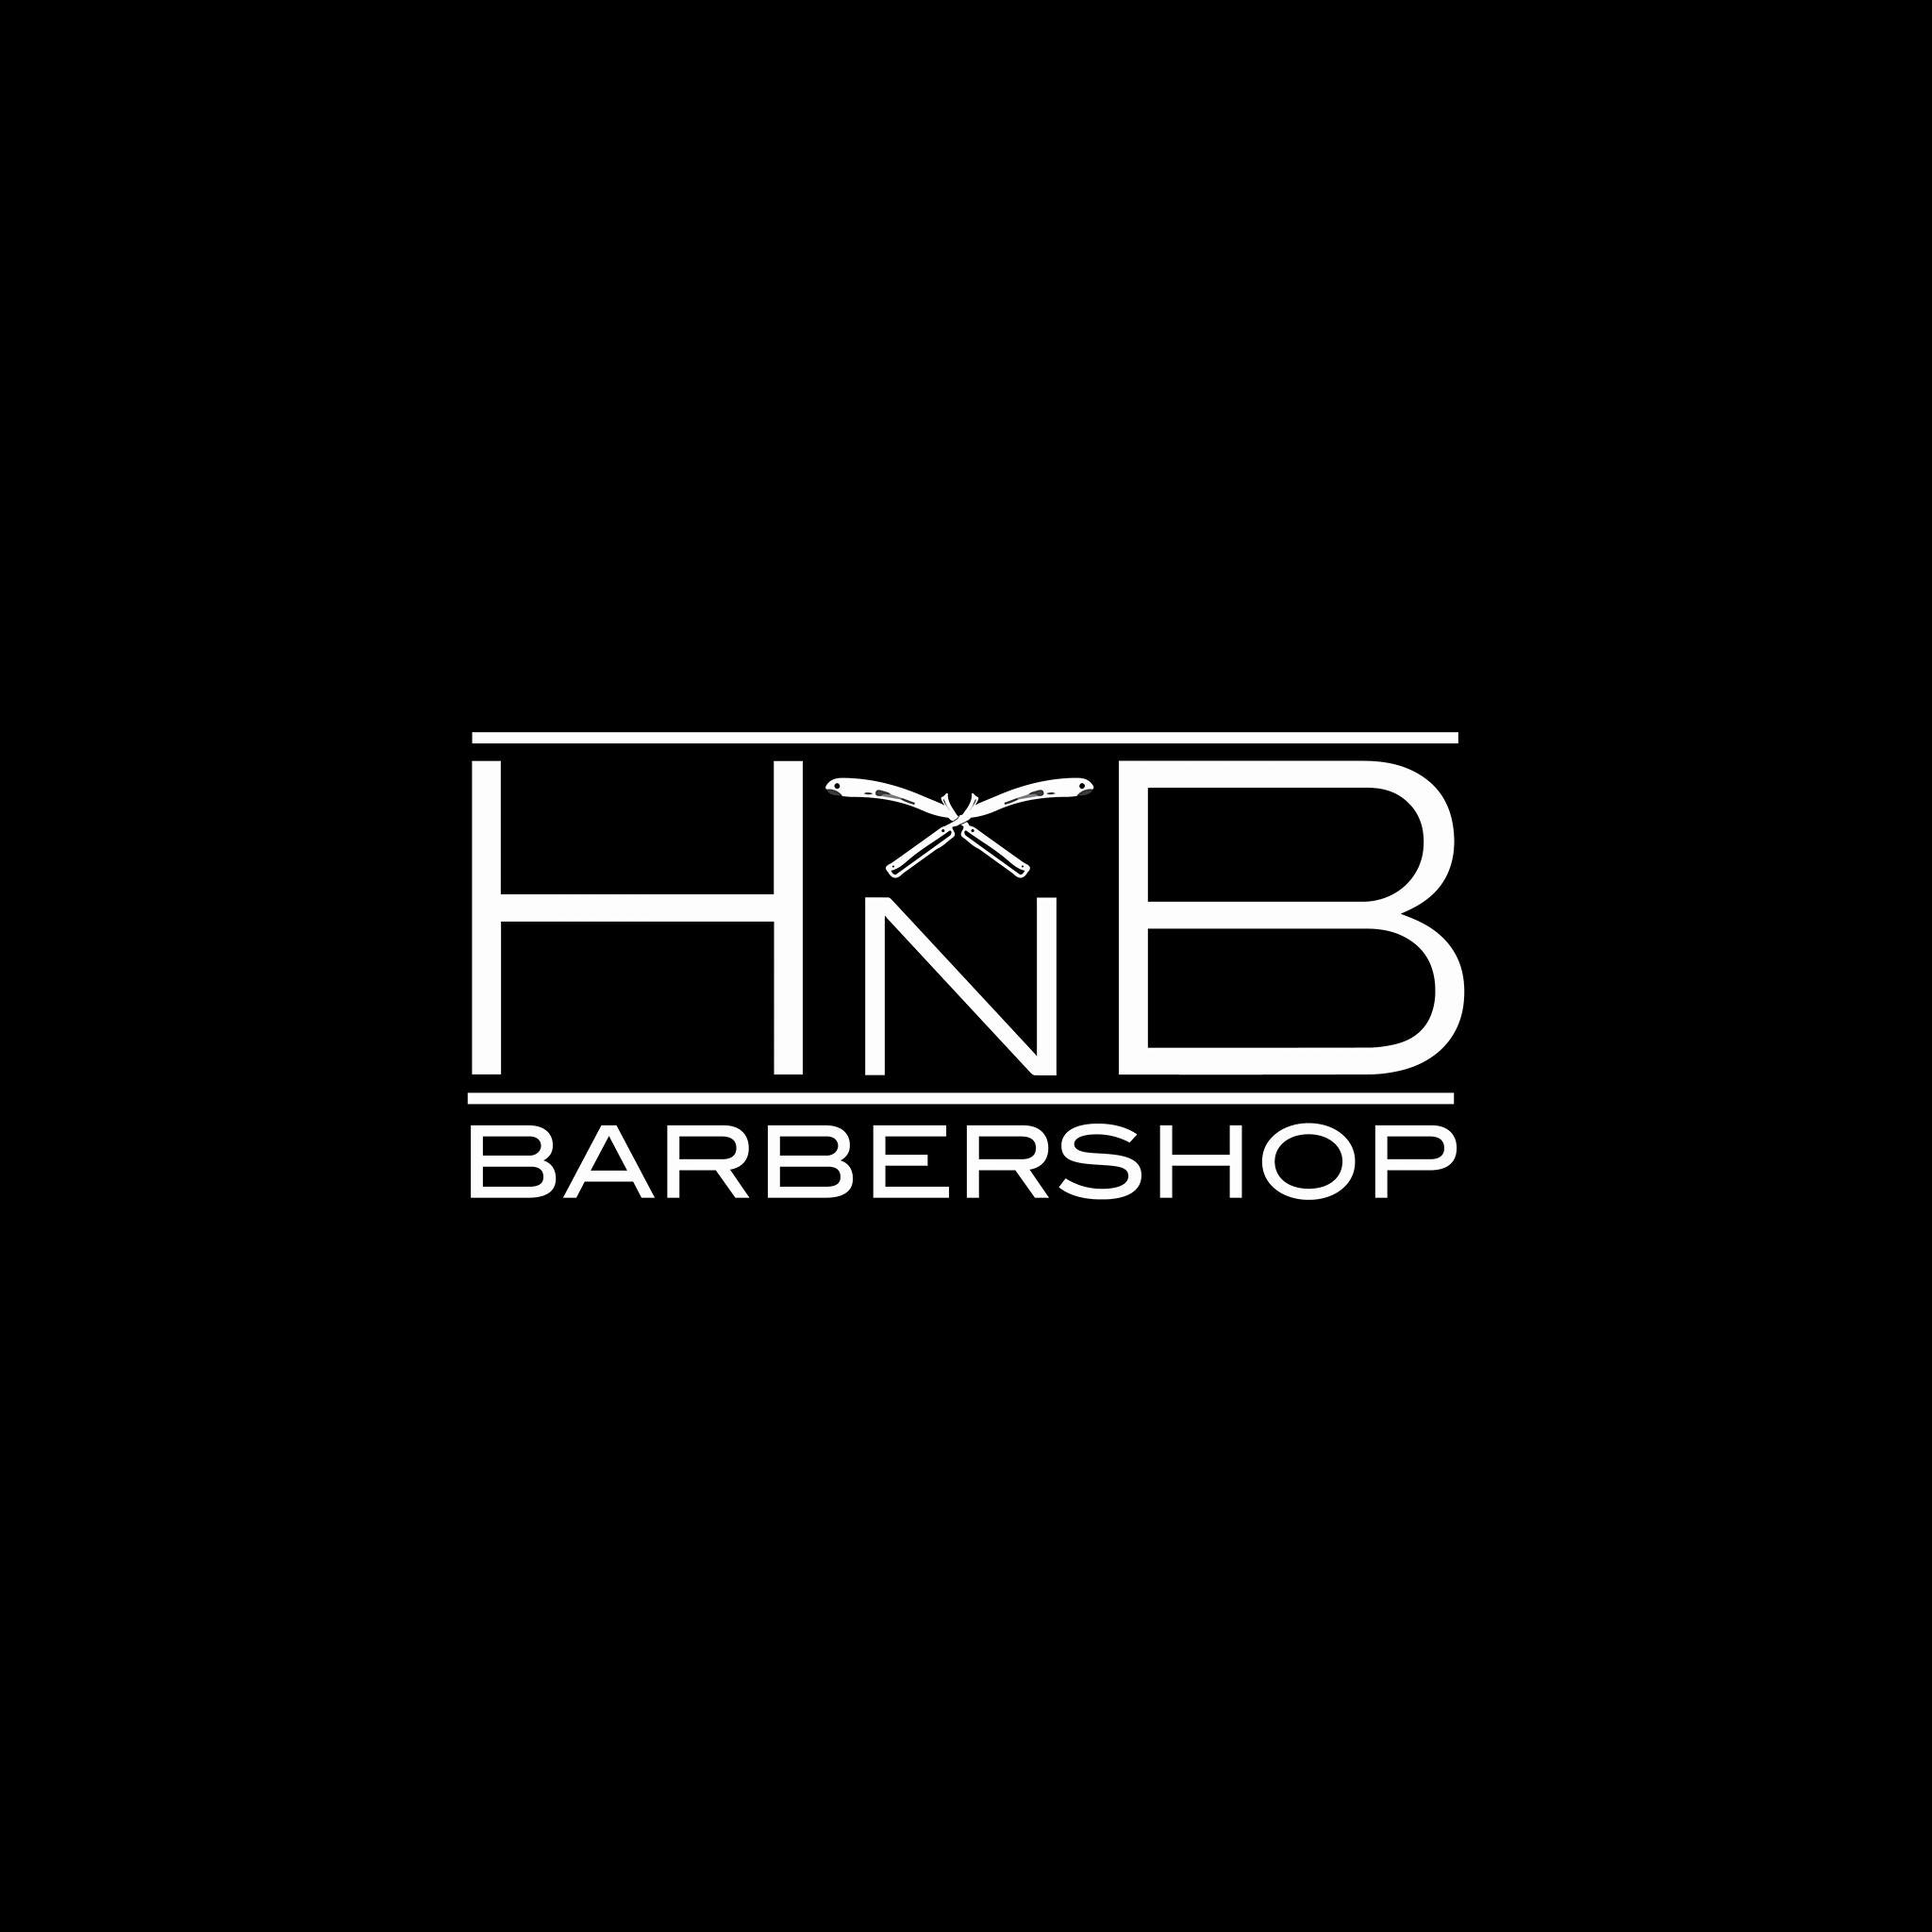 HNB BARBERSHOP